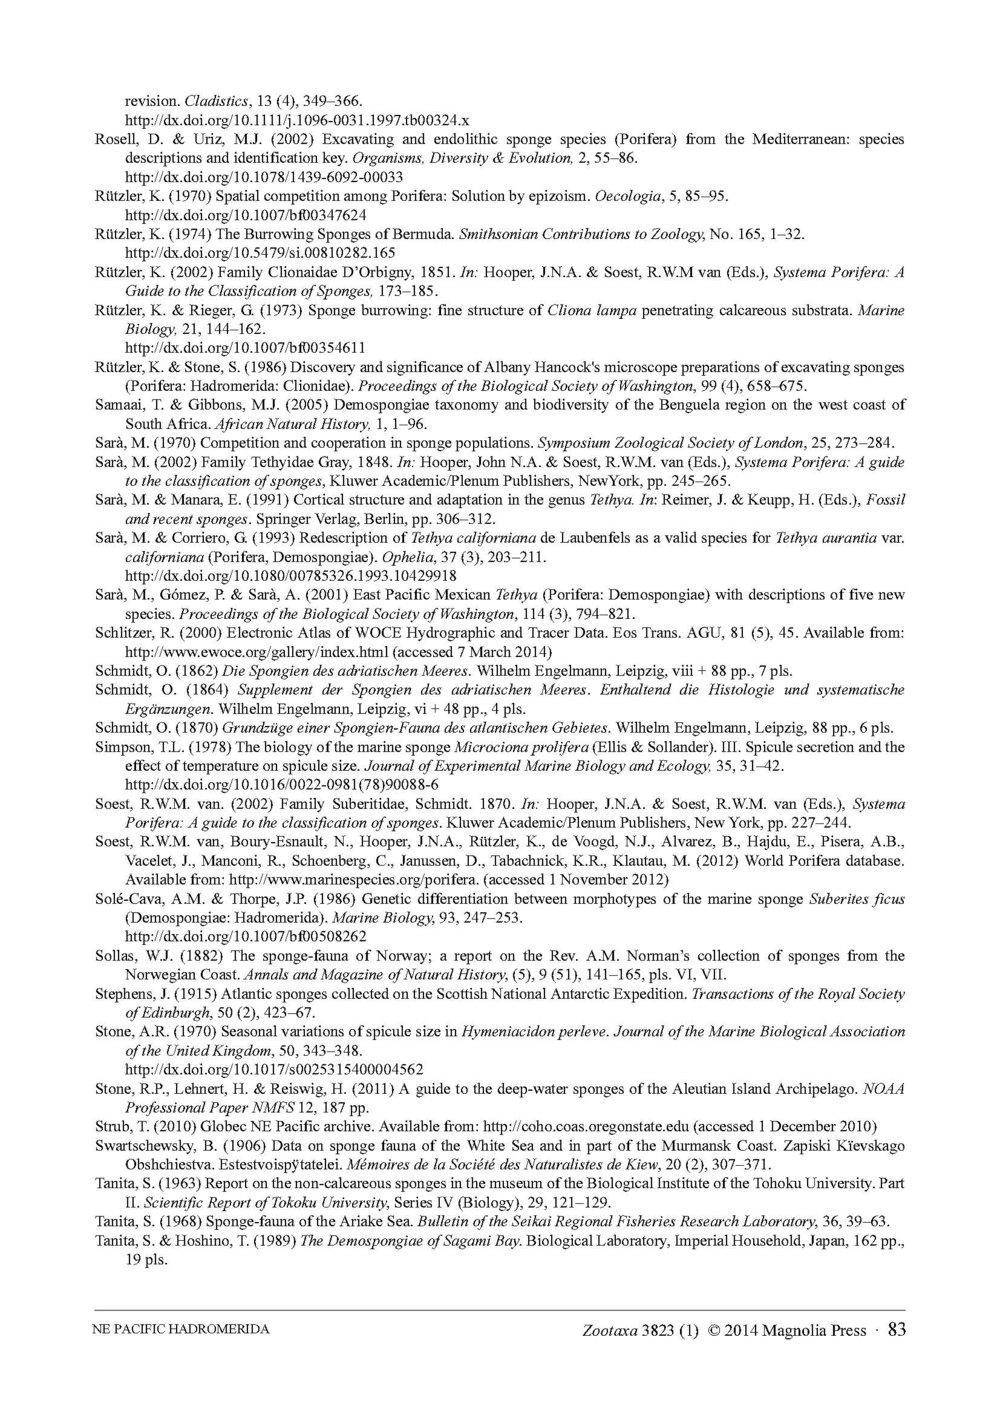 Austin et al 2014 NE Pacific Hadromerids_Page_83.jpg